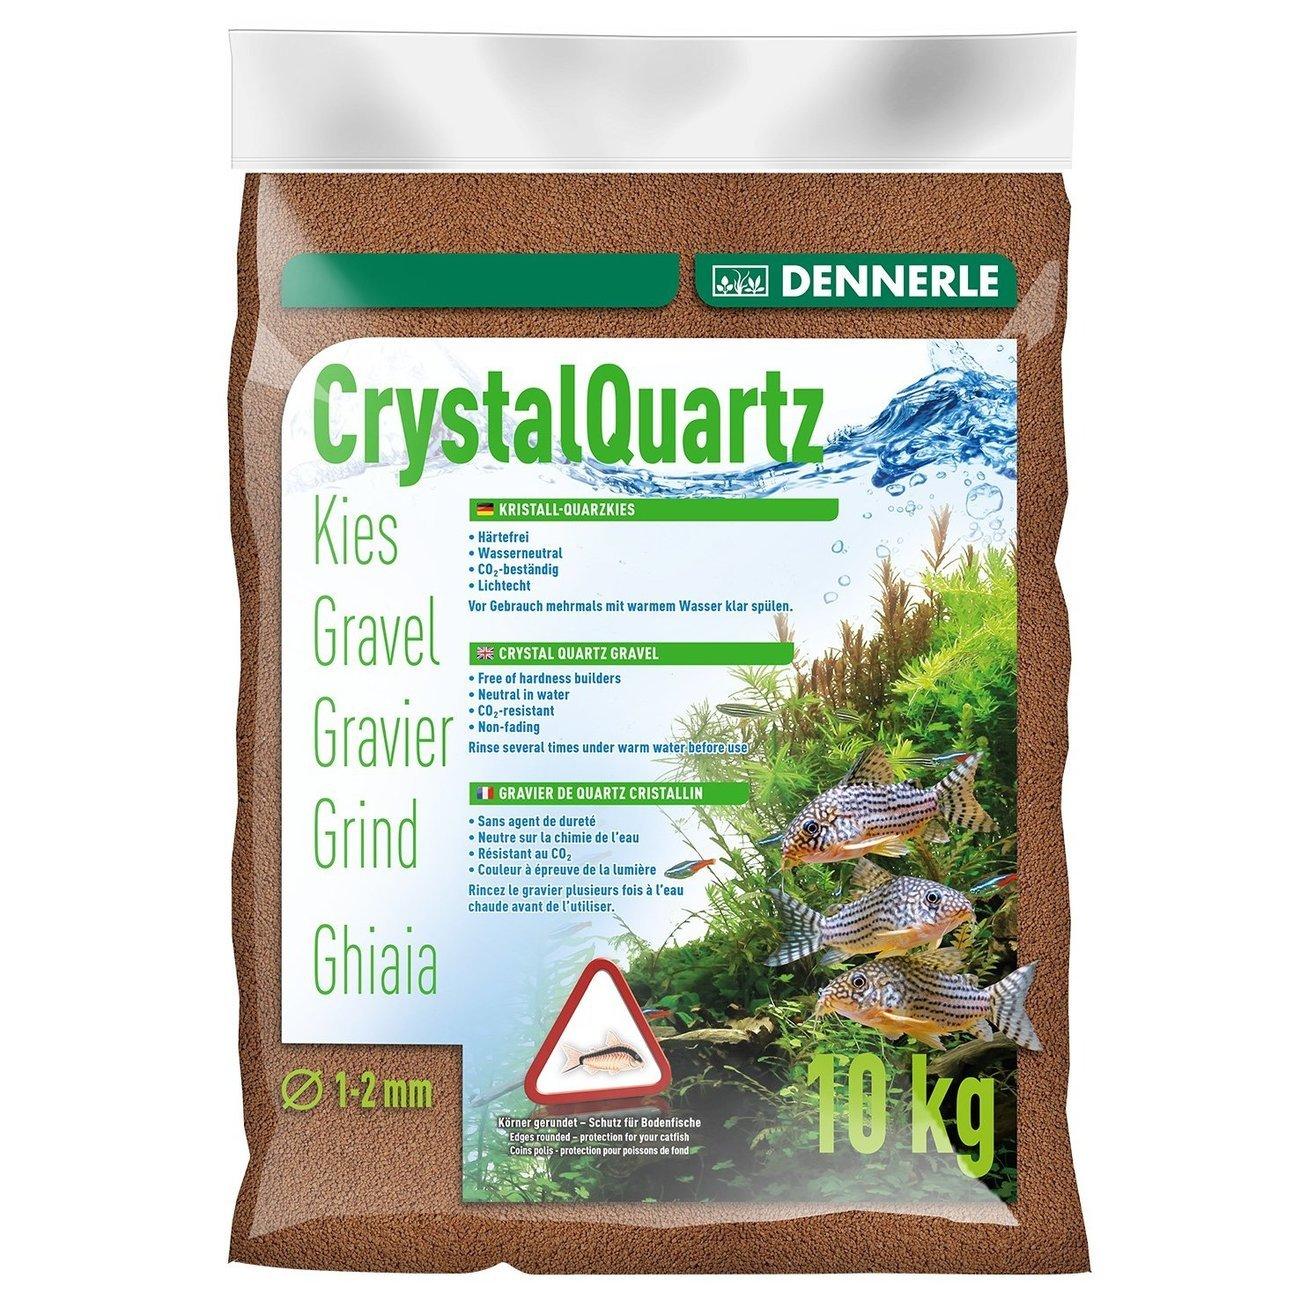 Dennerle Kristall-Quarzkies, 10 kg, rehbraun